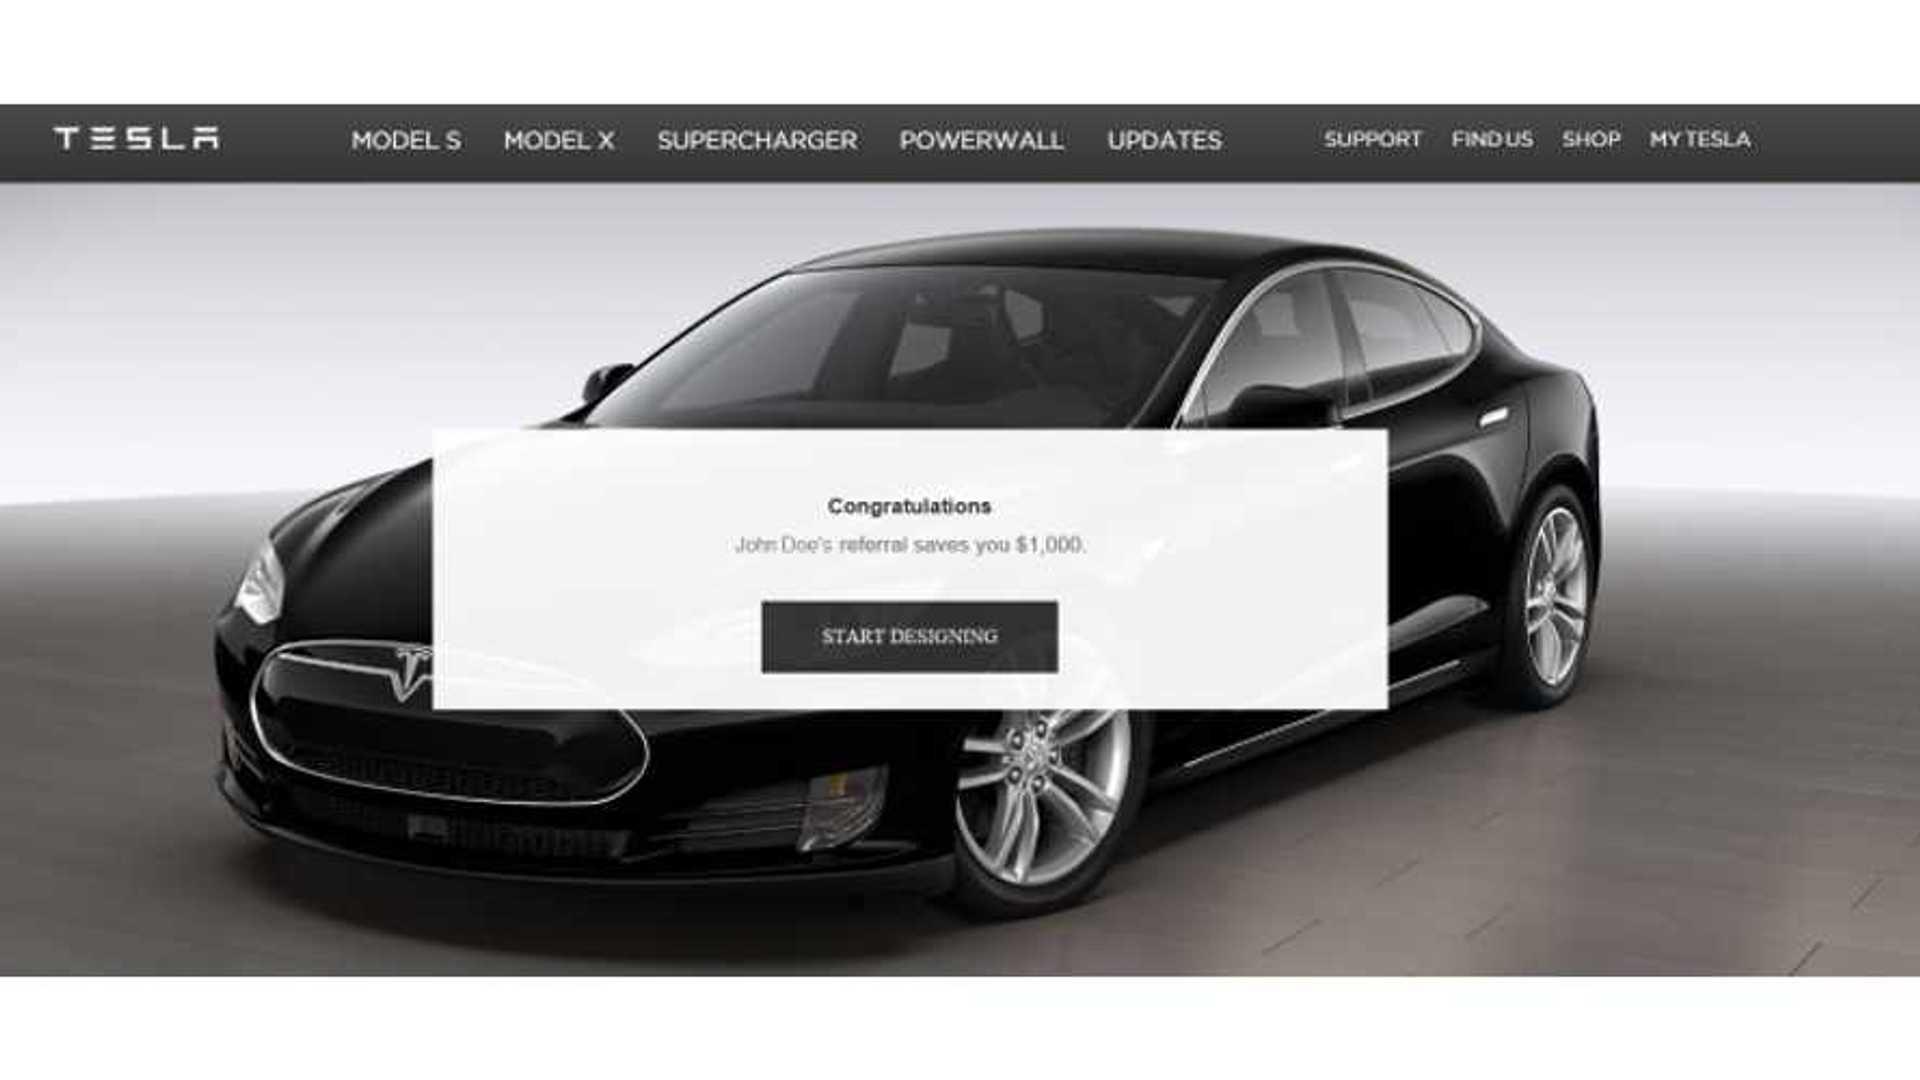 Tesla Referral Program >> Tesla S 1 000 Referral Program Is Against The Law In Virginia